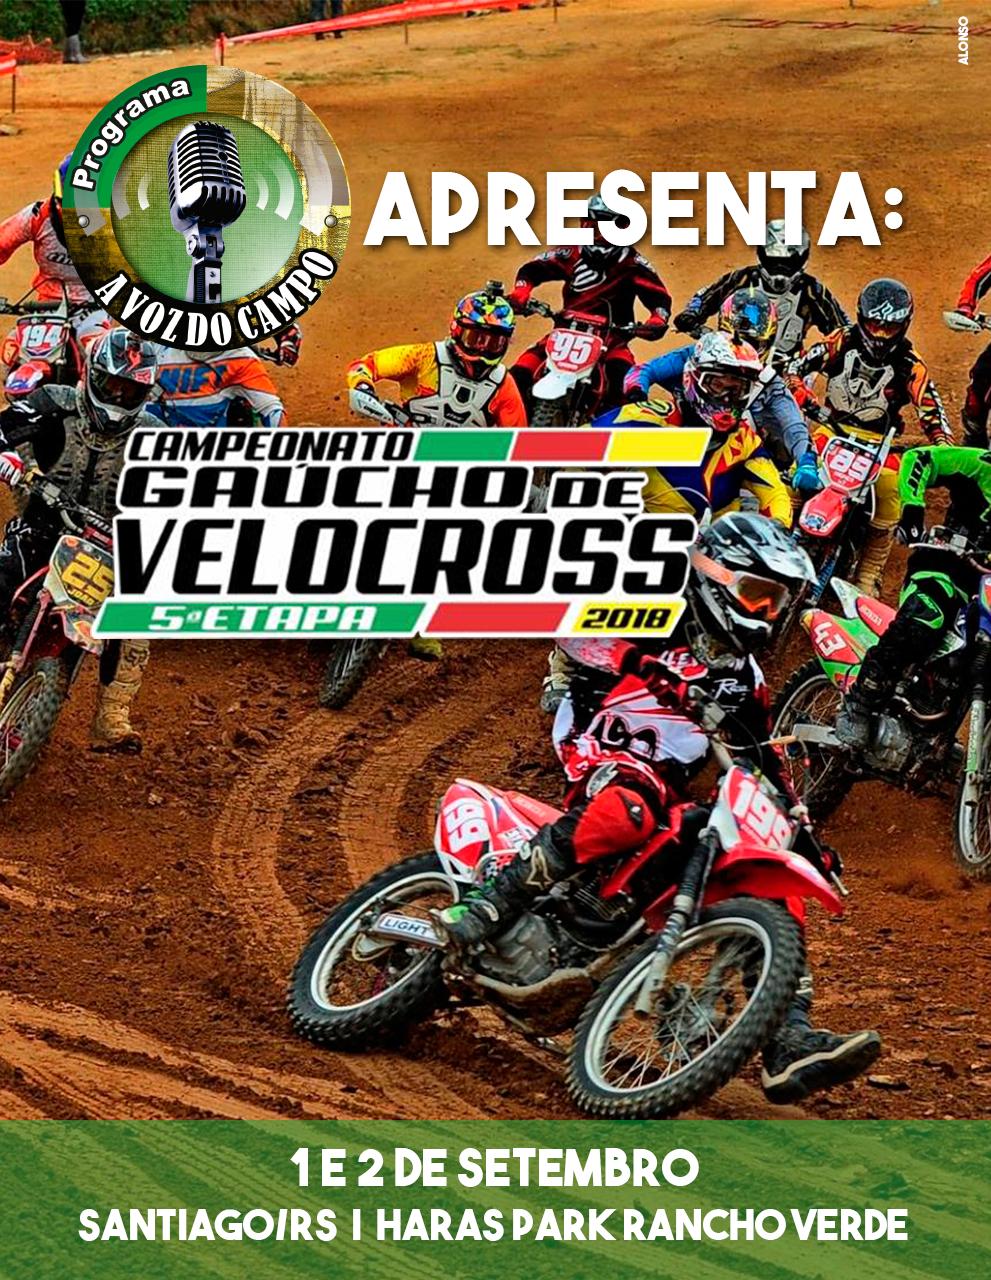 Campeonato de Velocross em Santiago